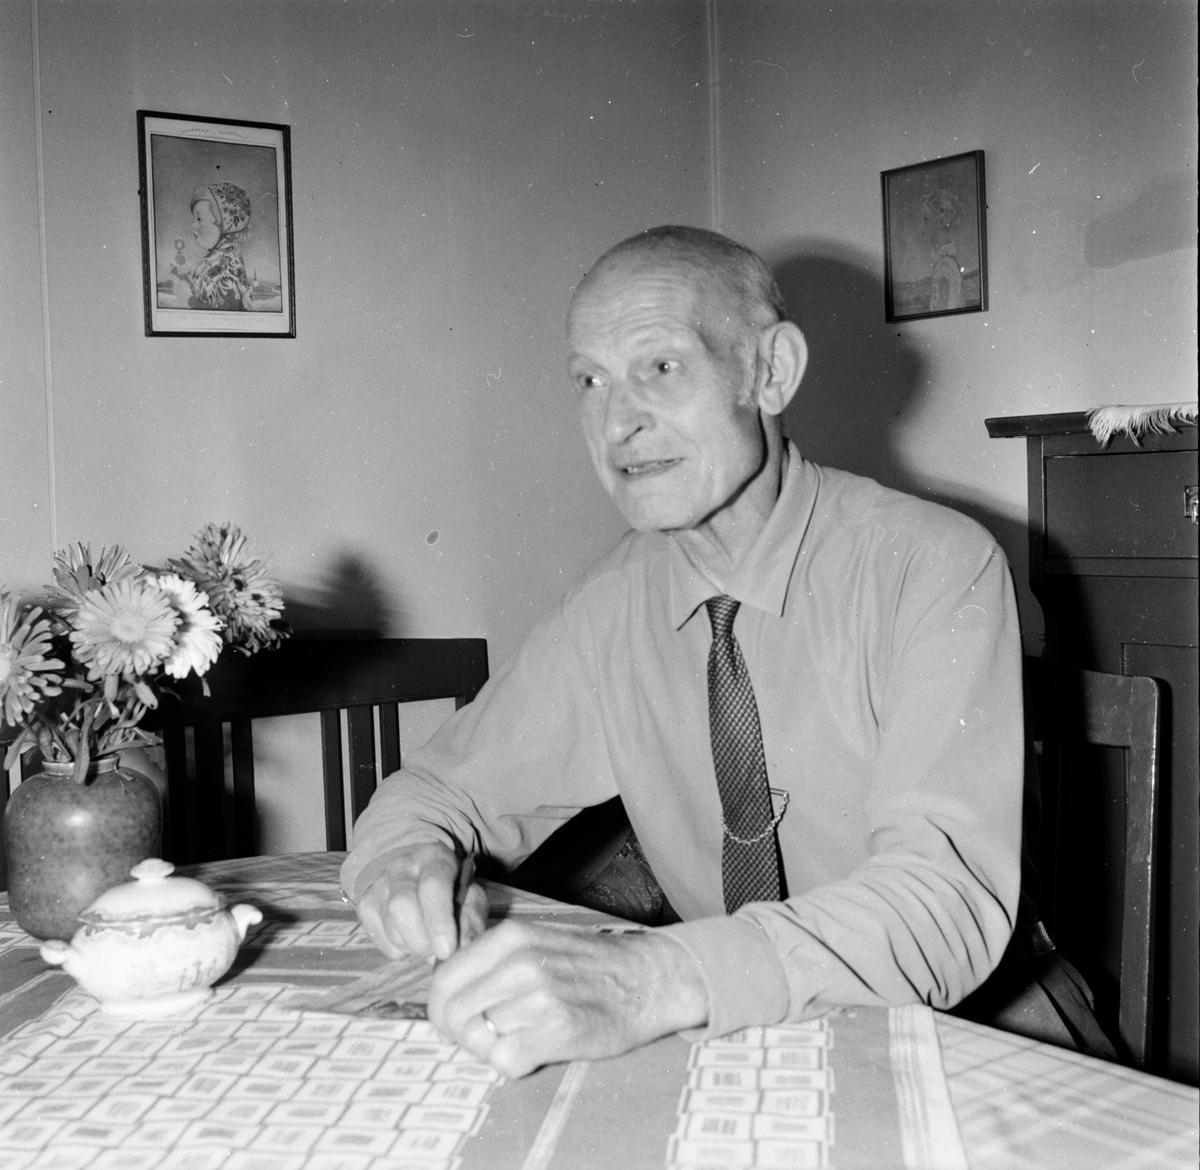 Persson Lars-O. Föredetta polisman. 29/9-1965